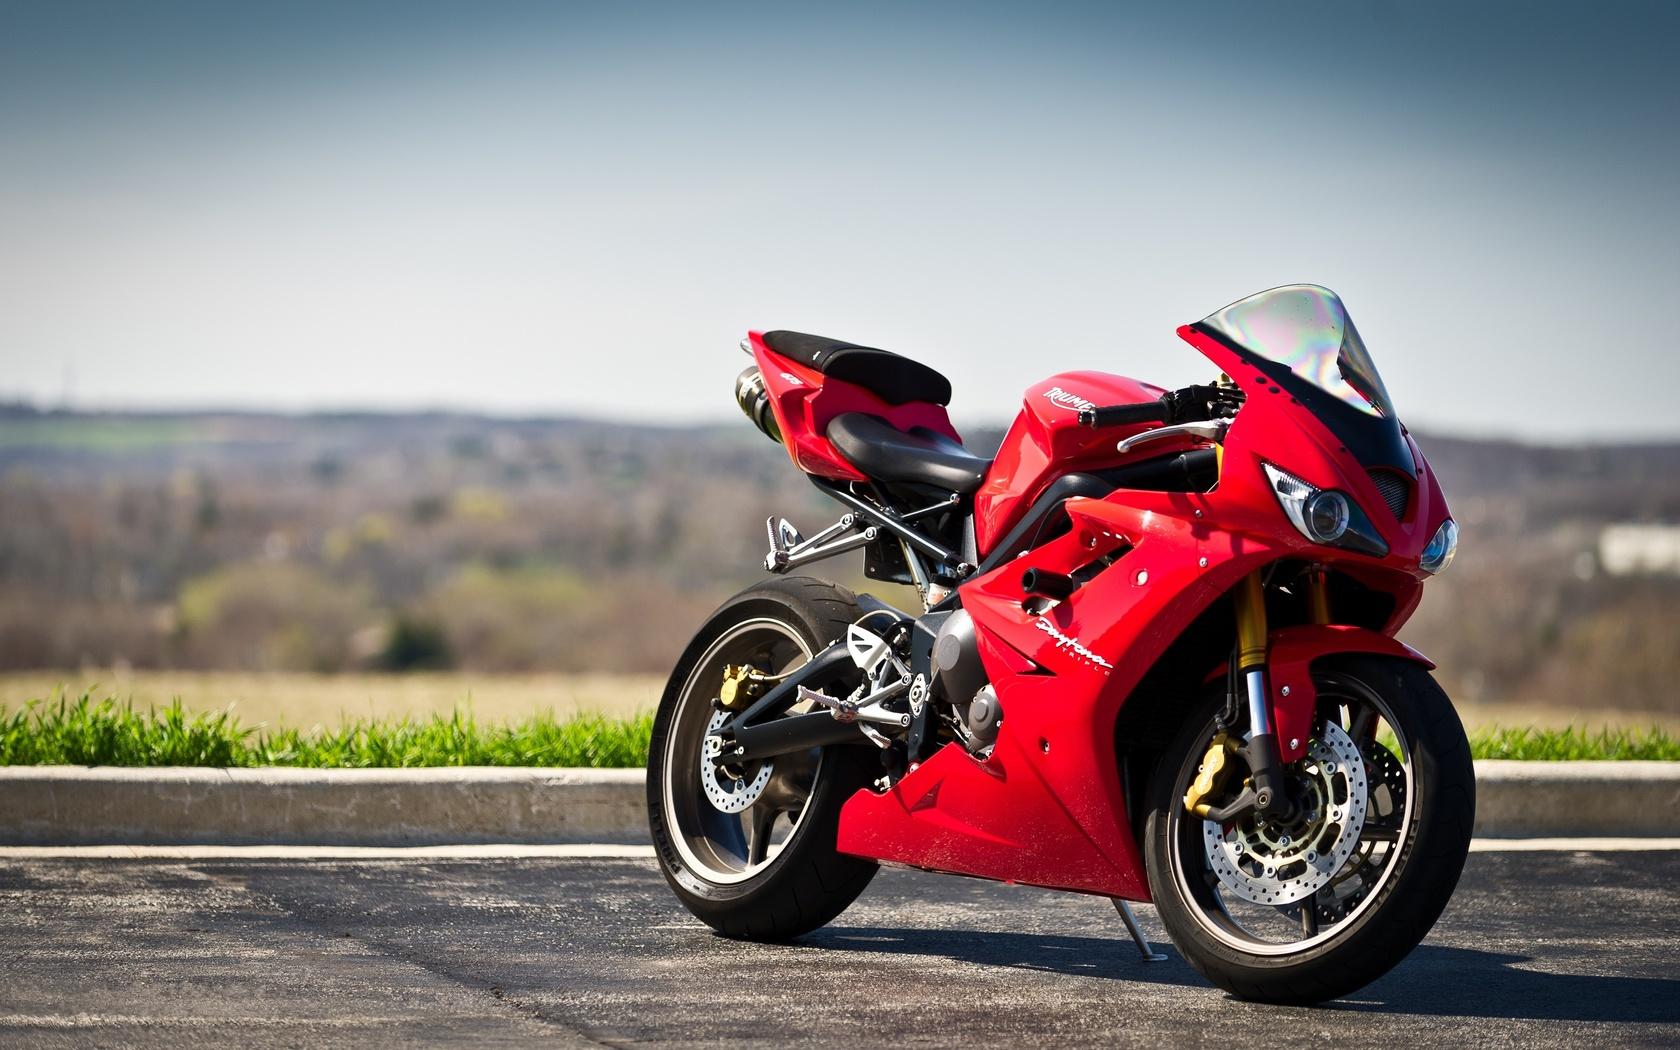 картинки байки мотоциклы фото продукт компромисса